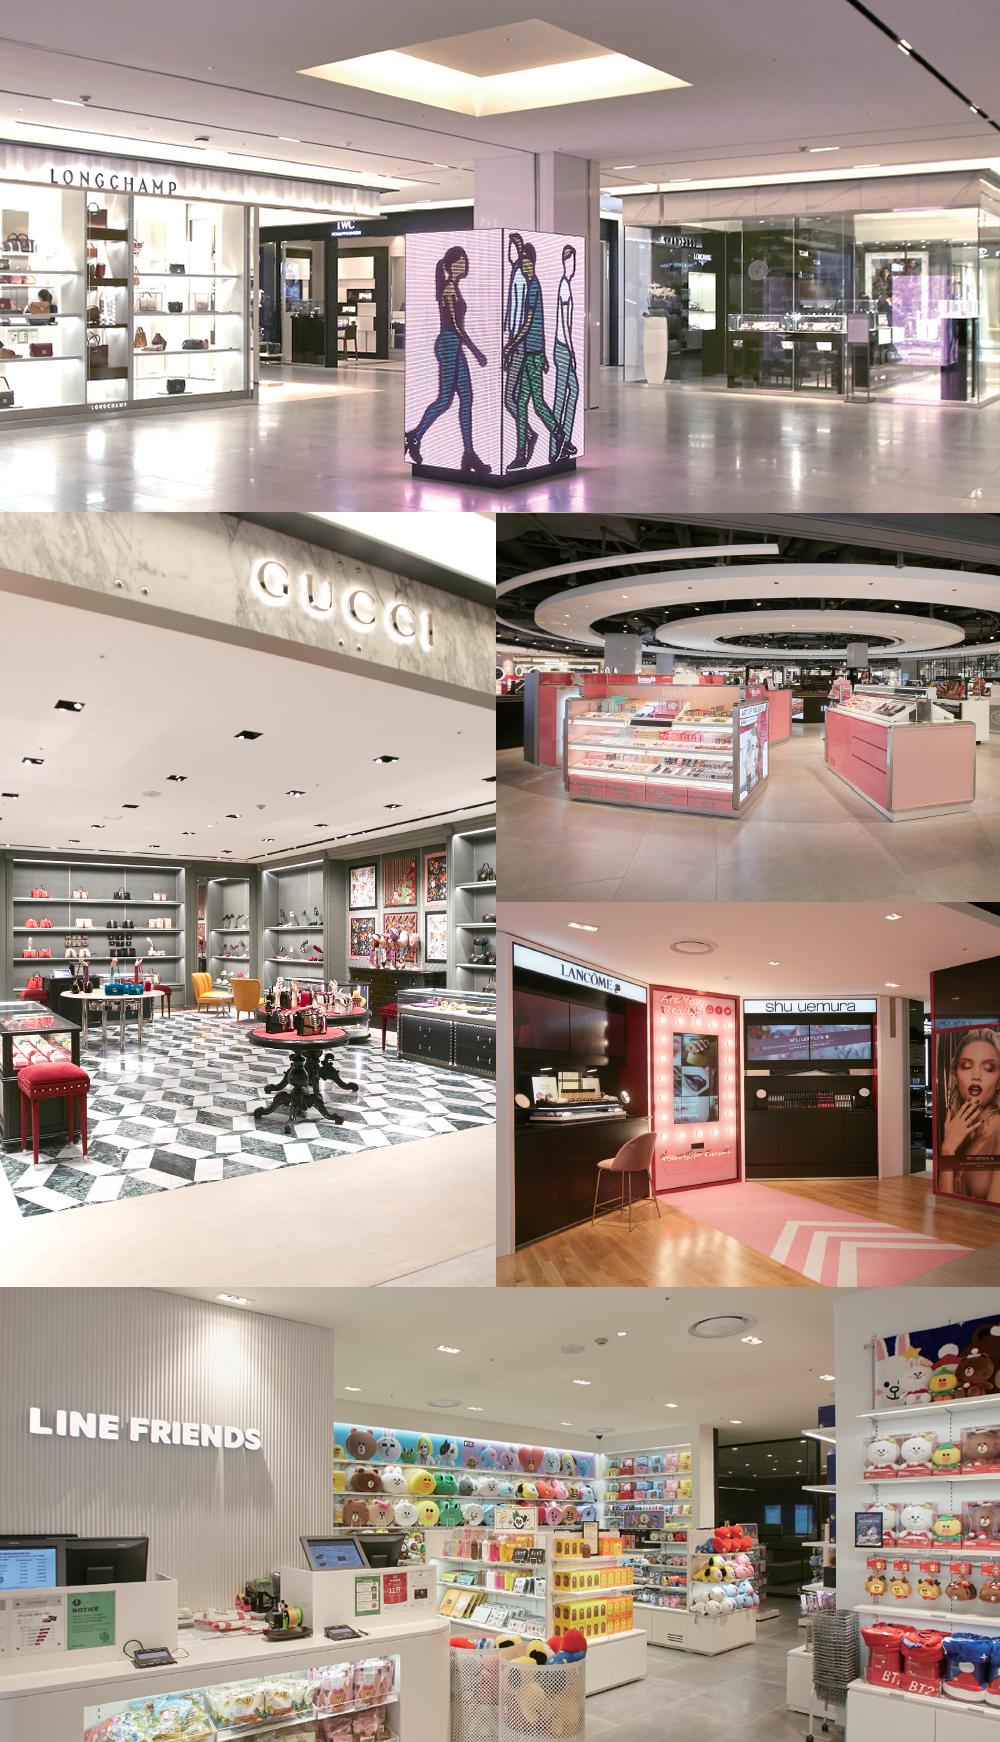 Baynaru_hyundai department store duty free 02.jpg